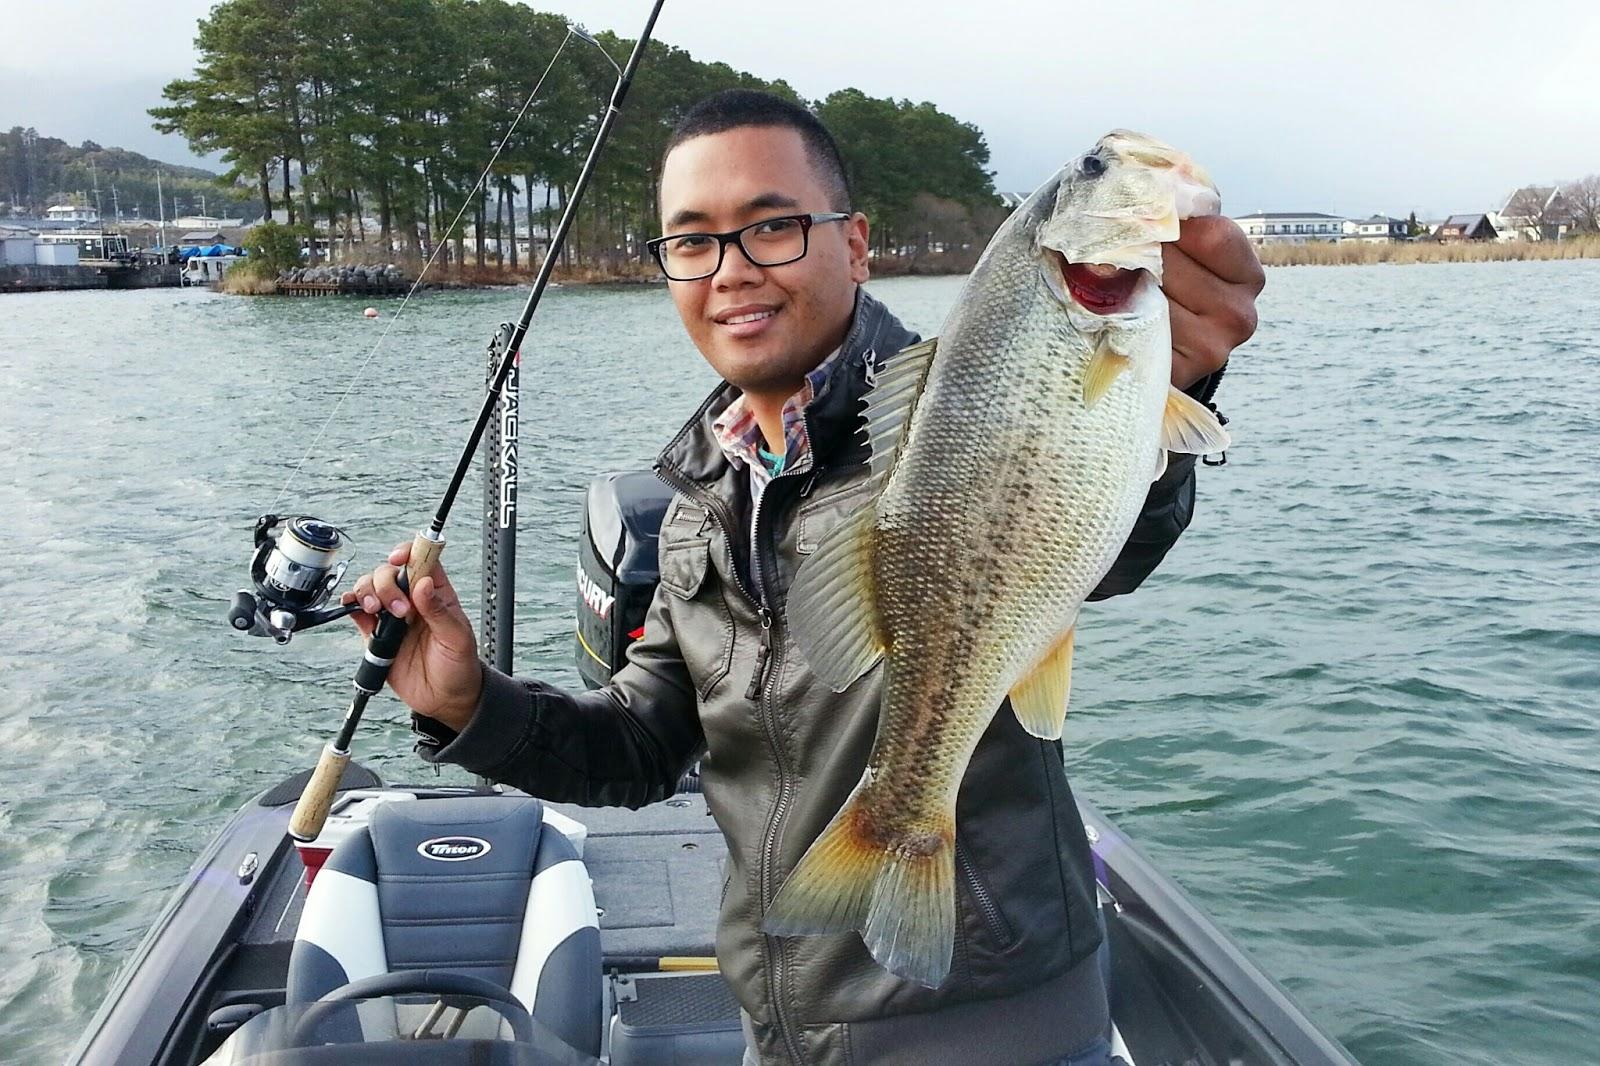 Fishing lake biwa urban fishing for Best bass fishing lakes near me